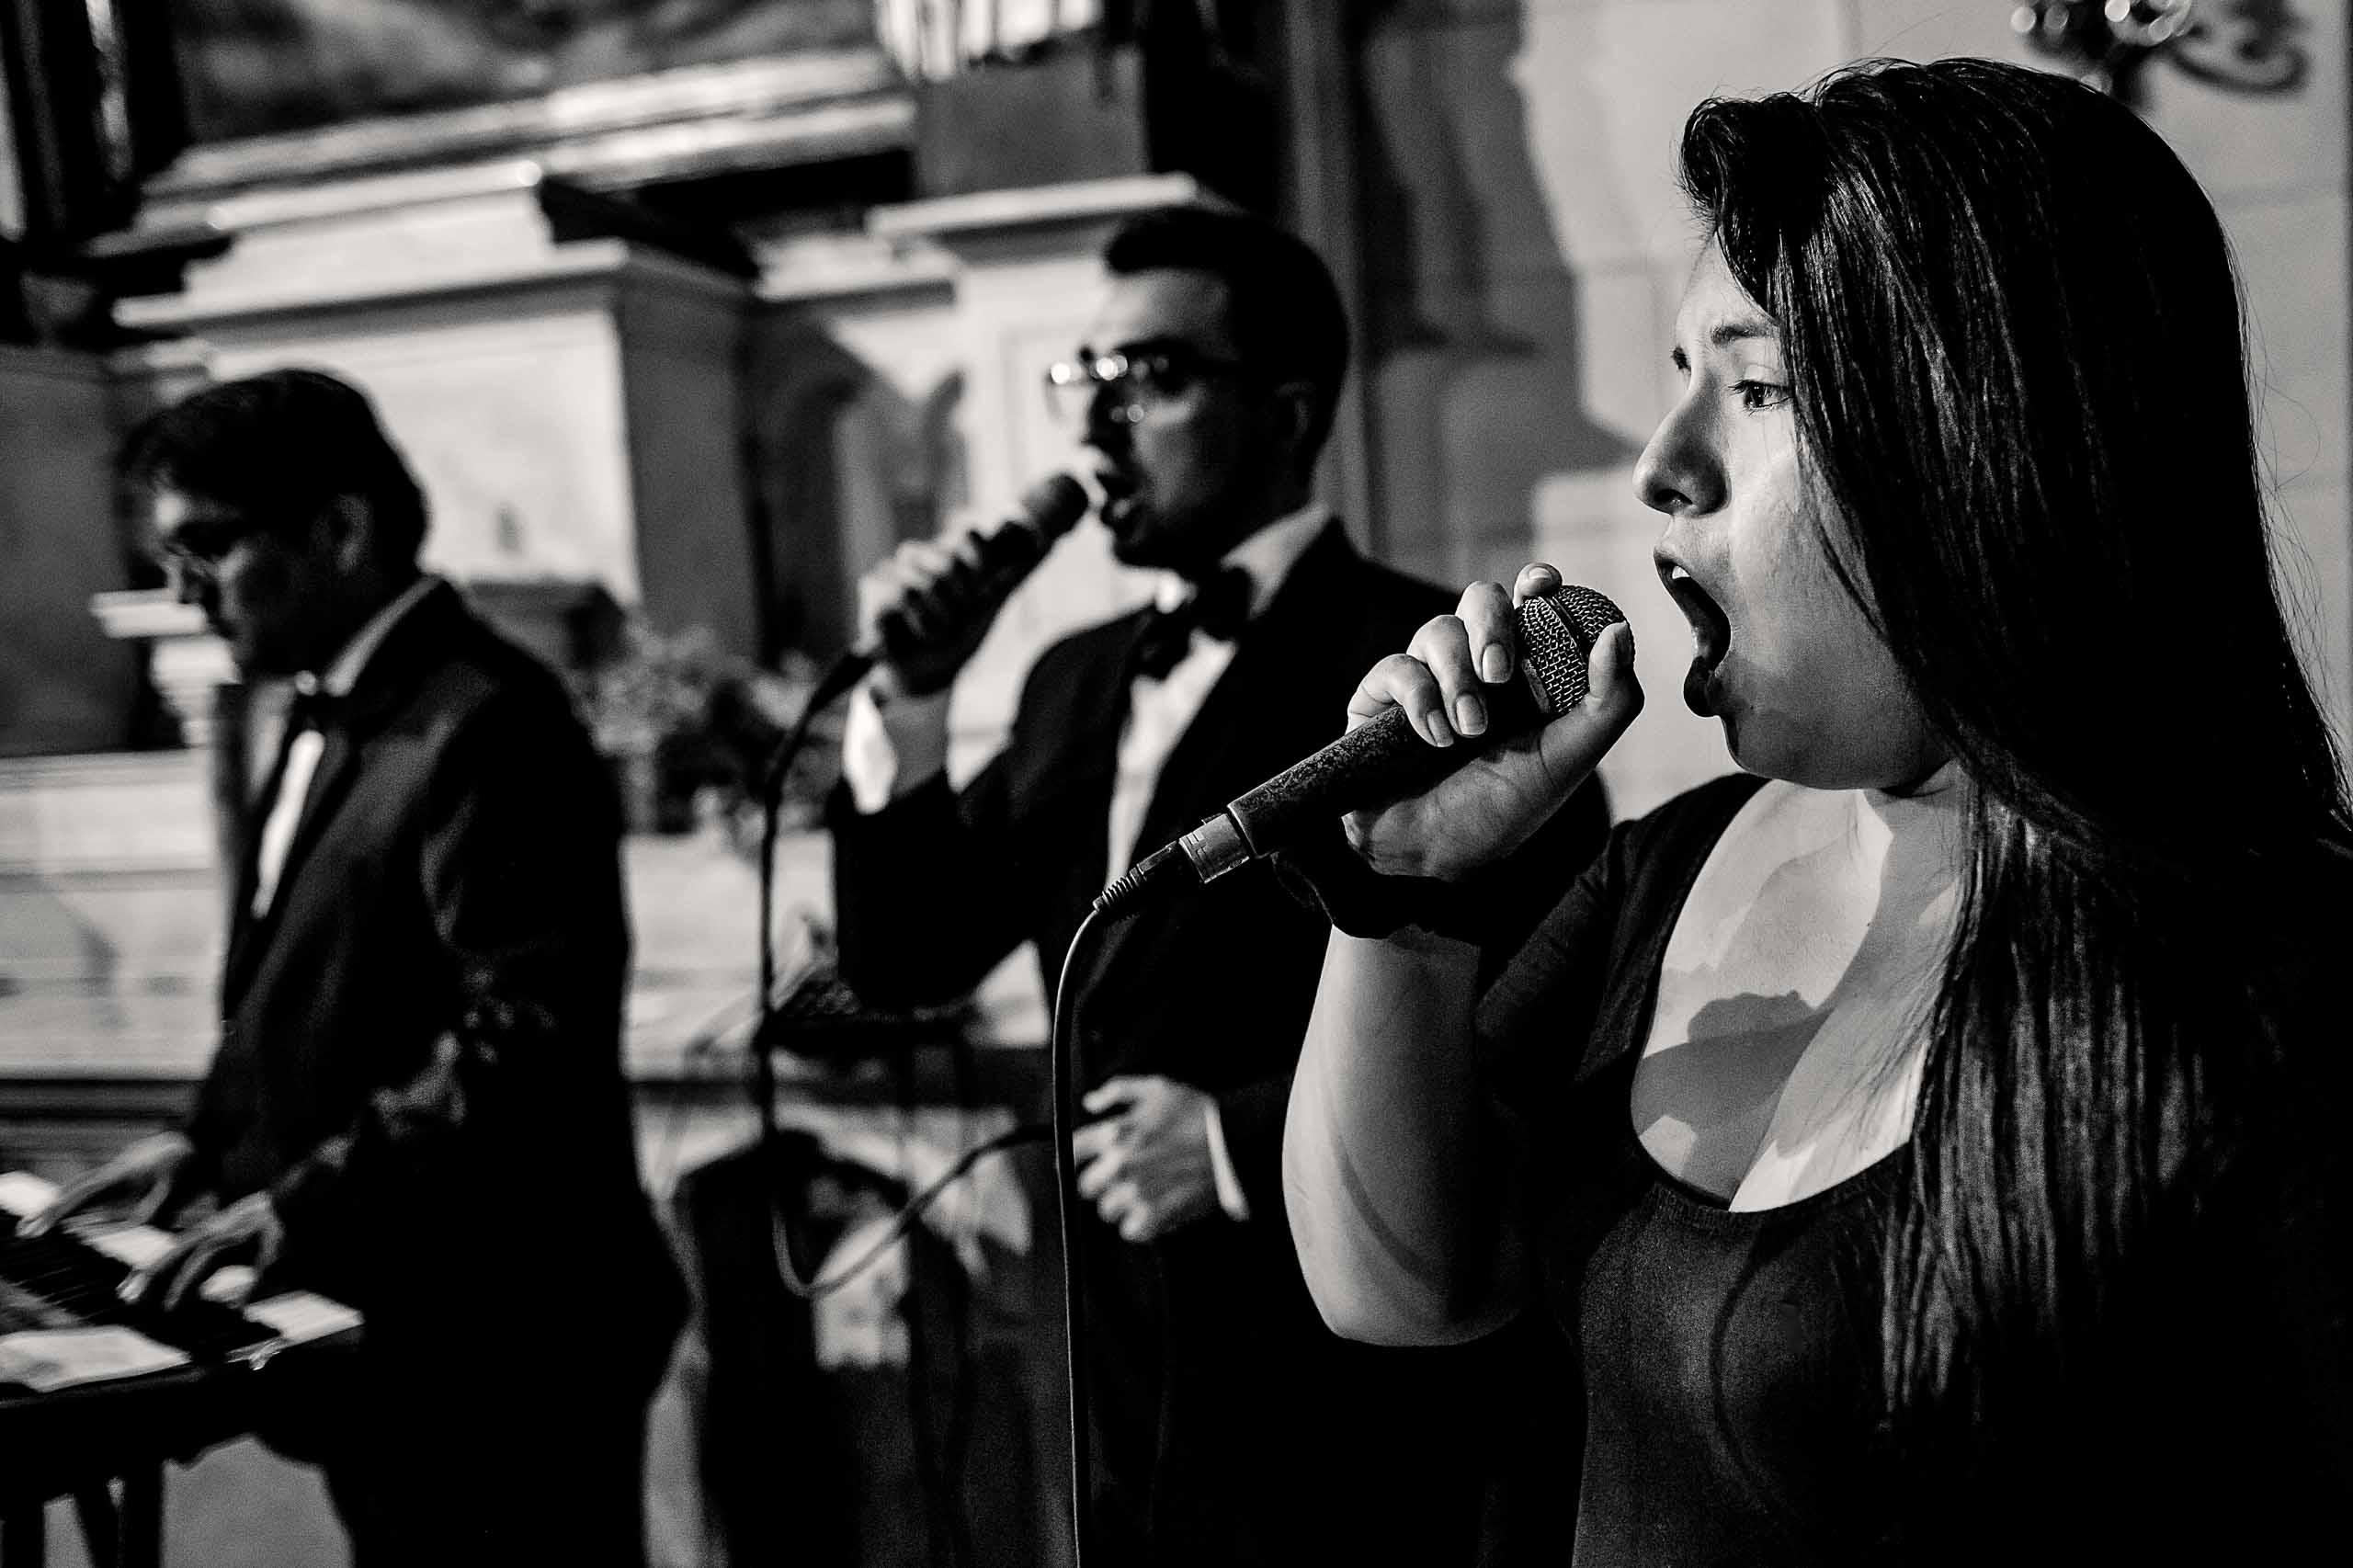 Singer singing during wedding ceremony